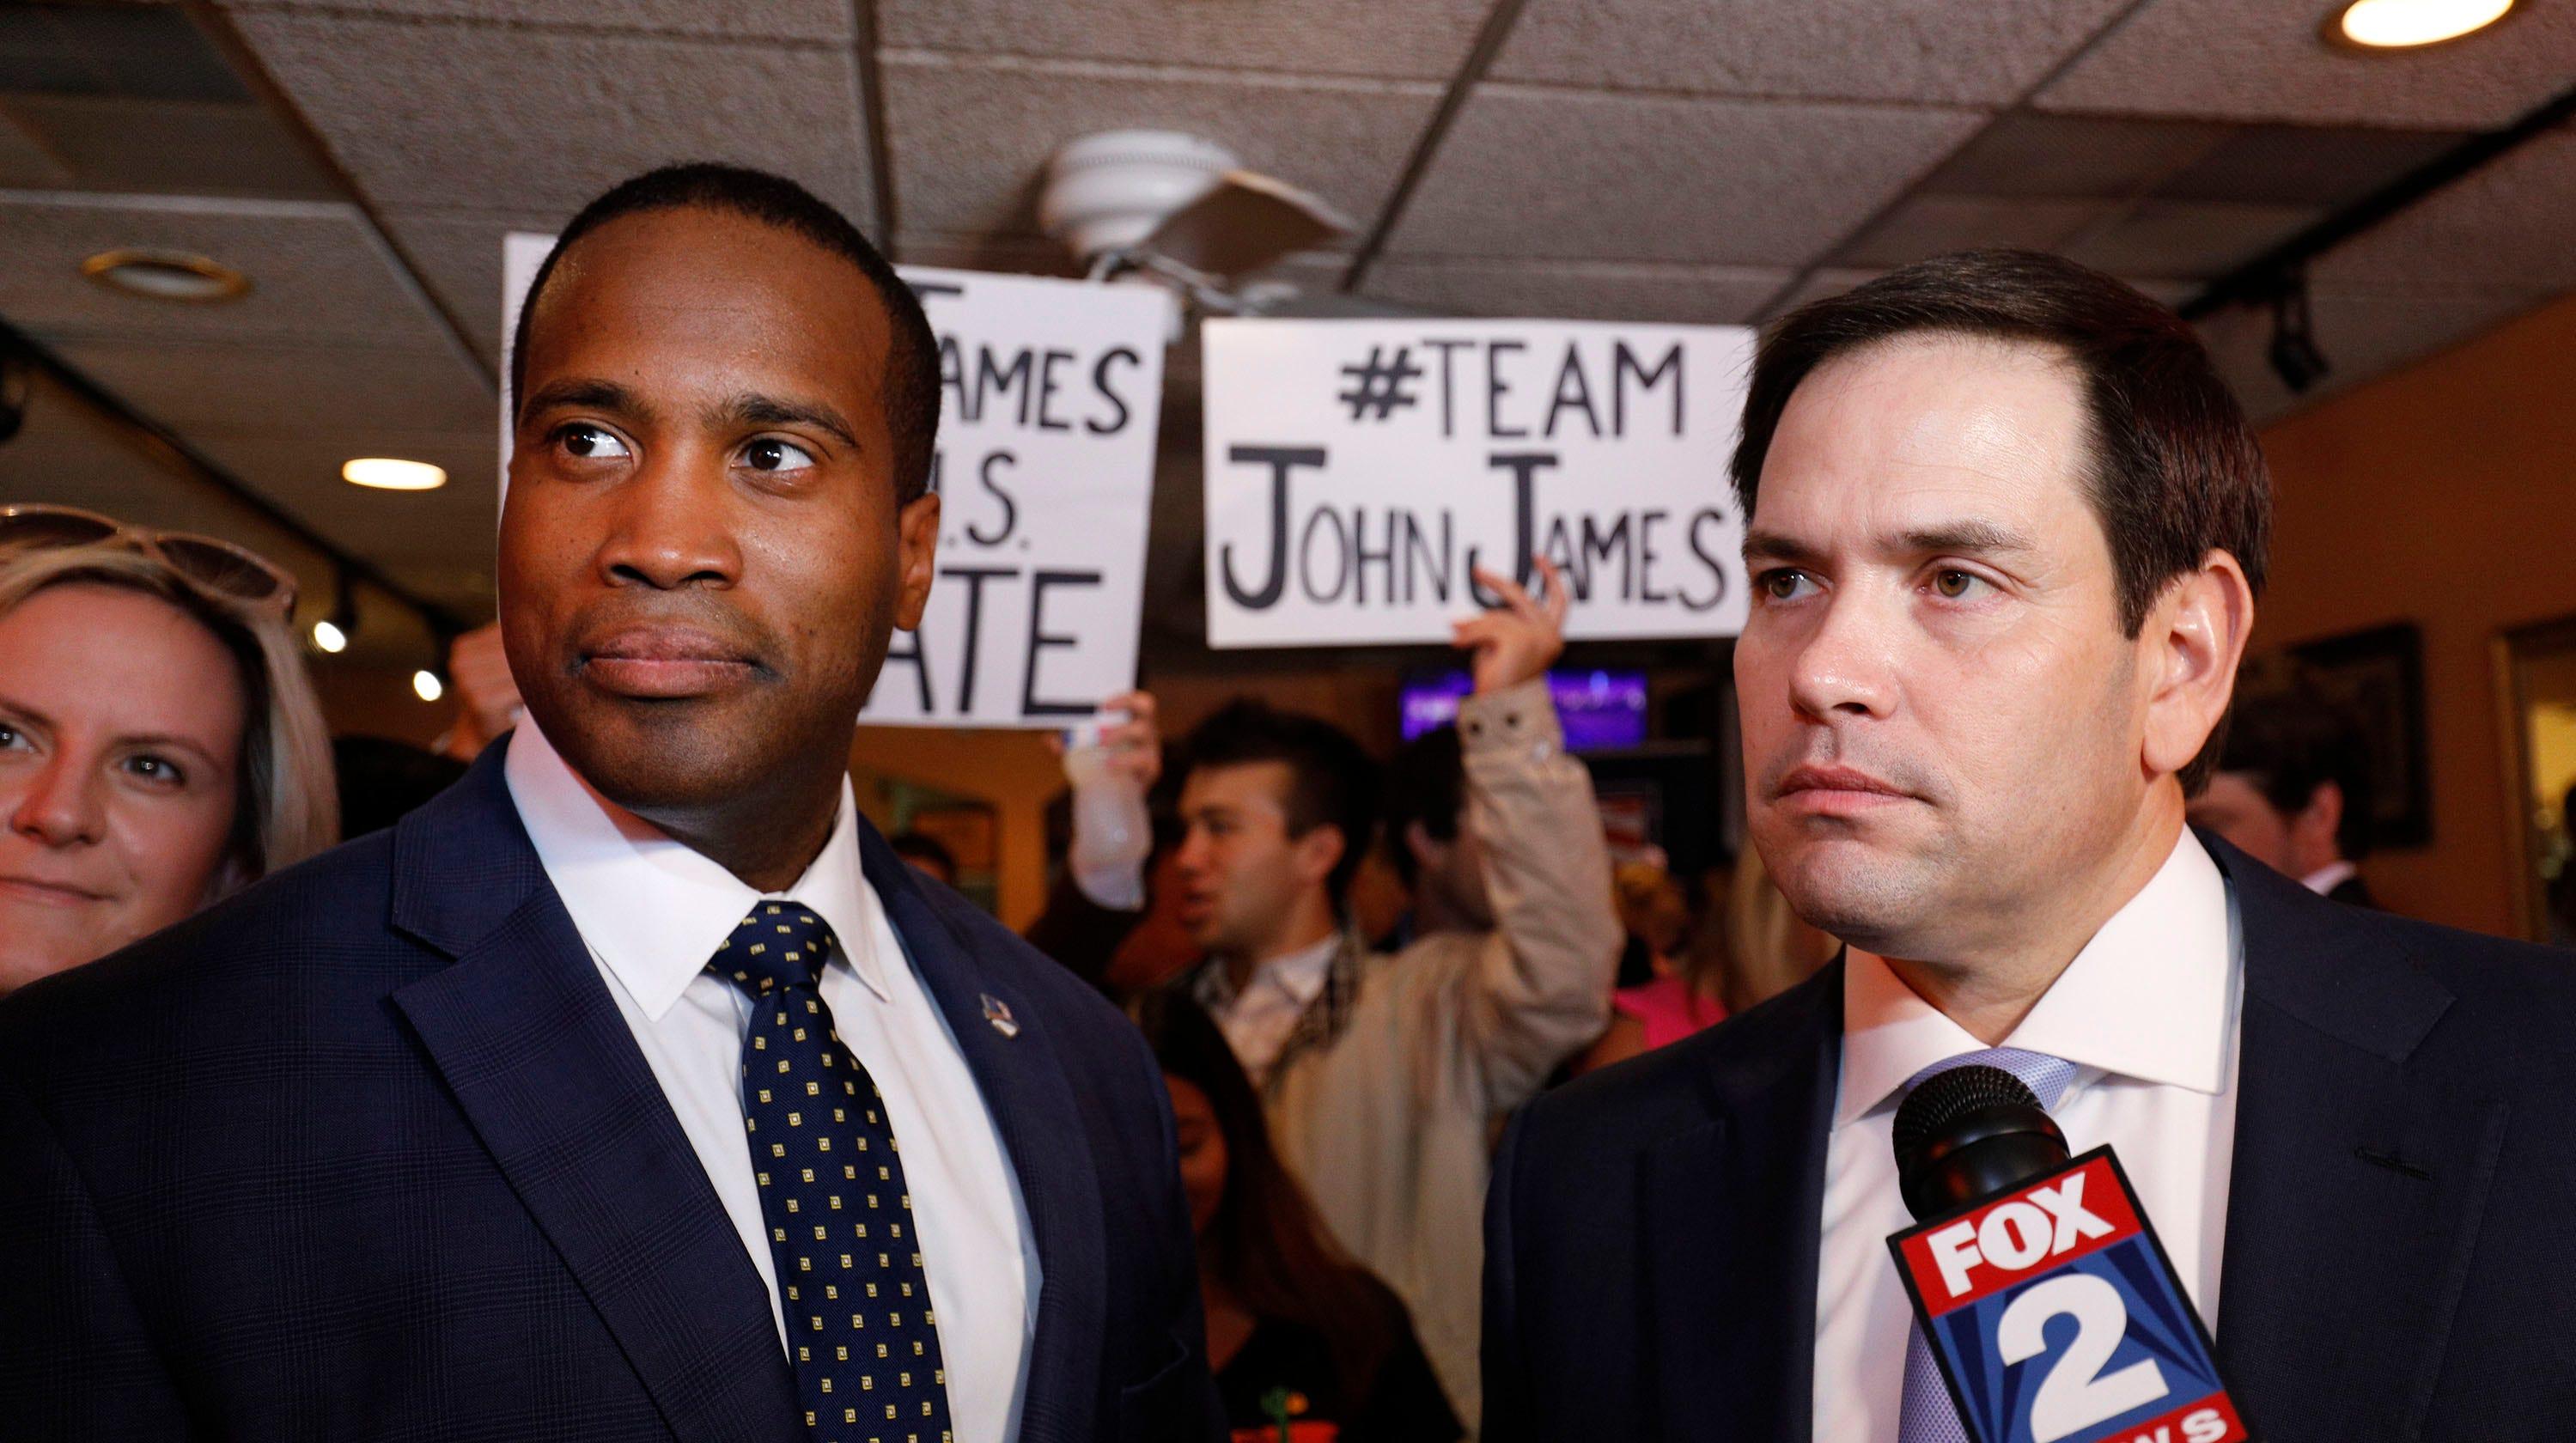 Rubio promotes James' Senate bid in Detroit visit